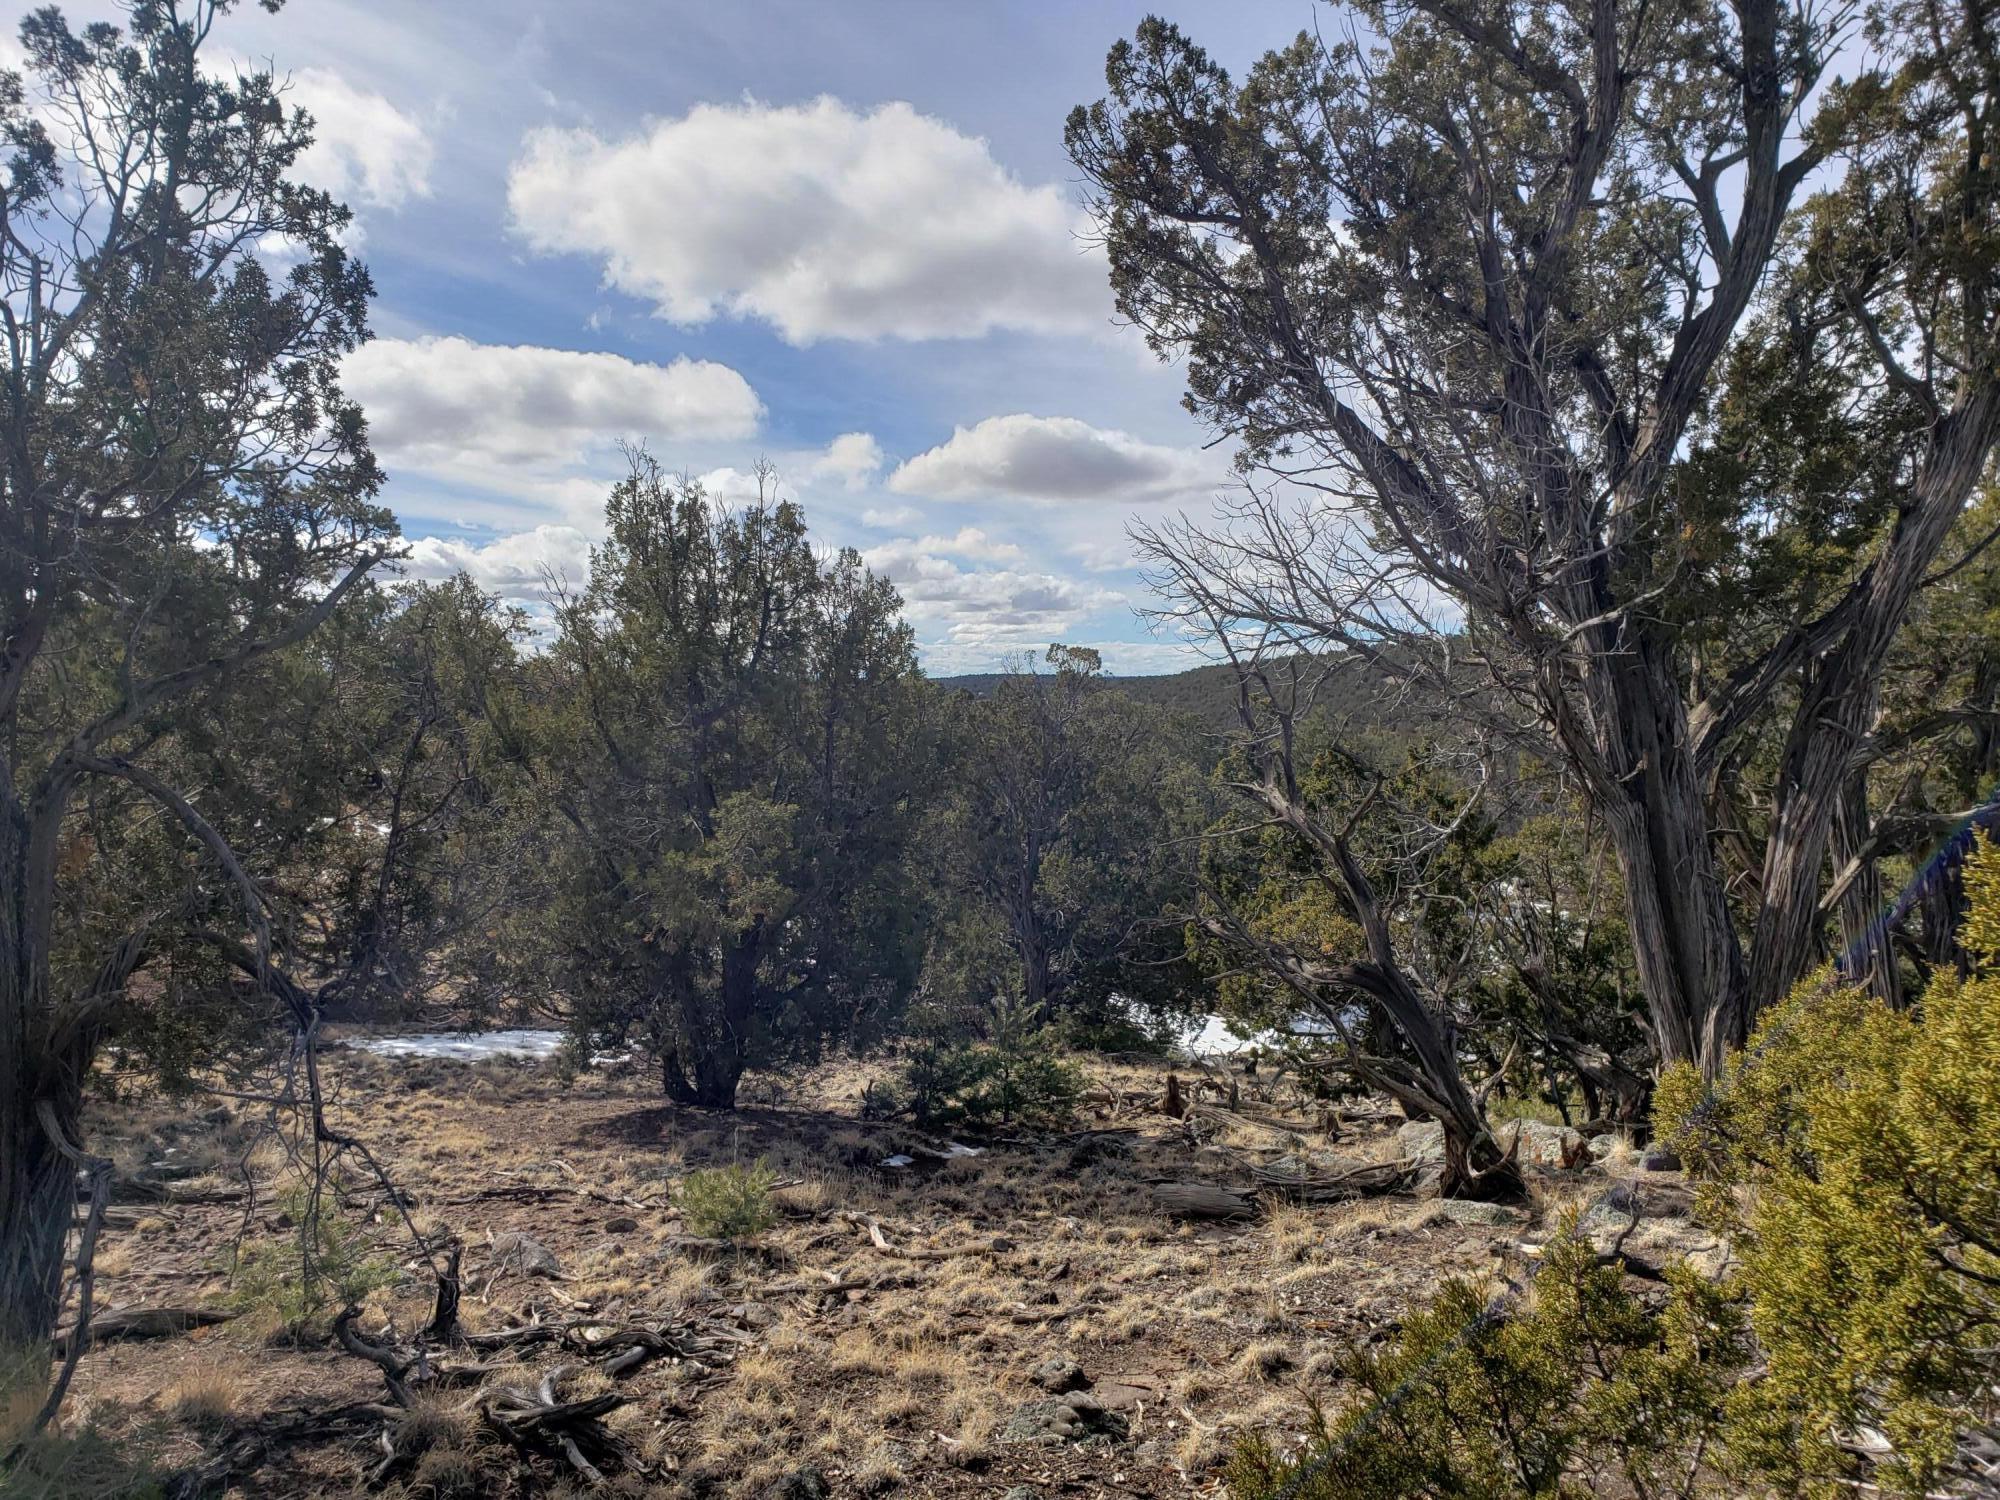 Lot 89 Starfire Drive Property Photo - Quemado, NM real estate listing